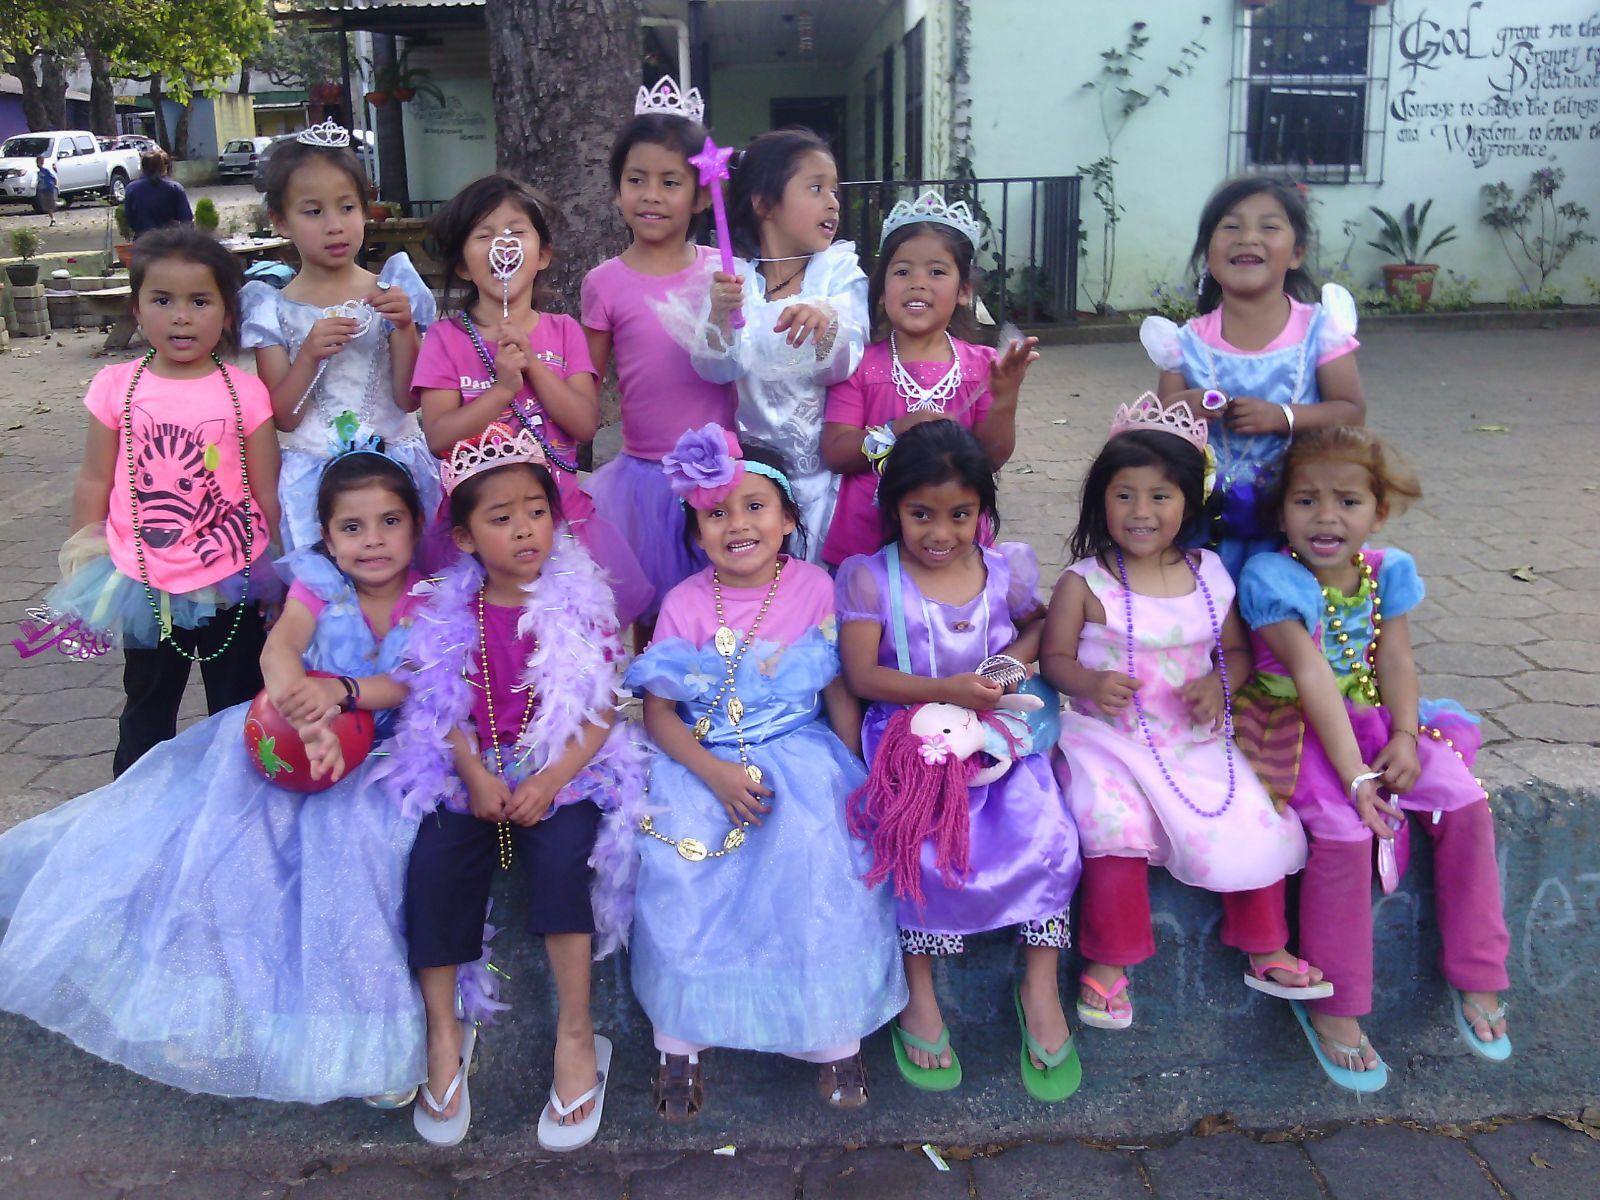 I miss my princesses